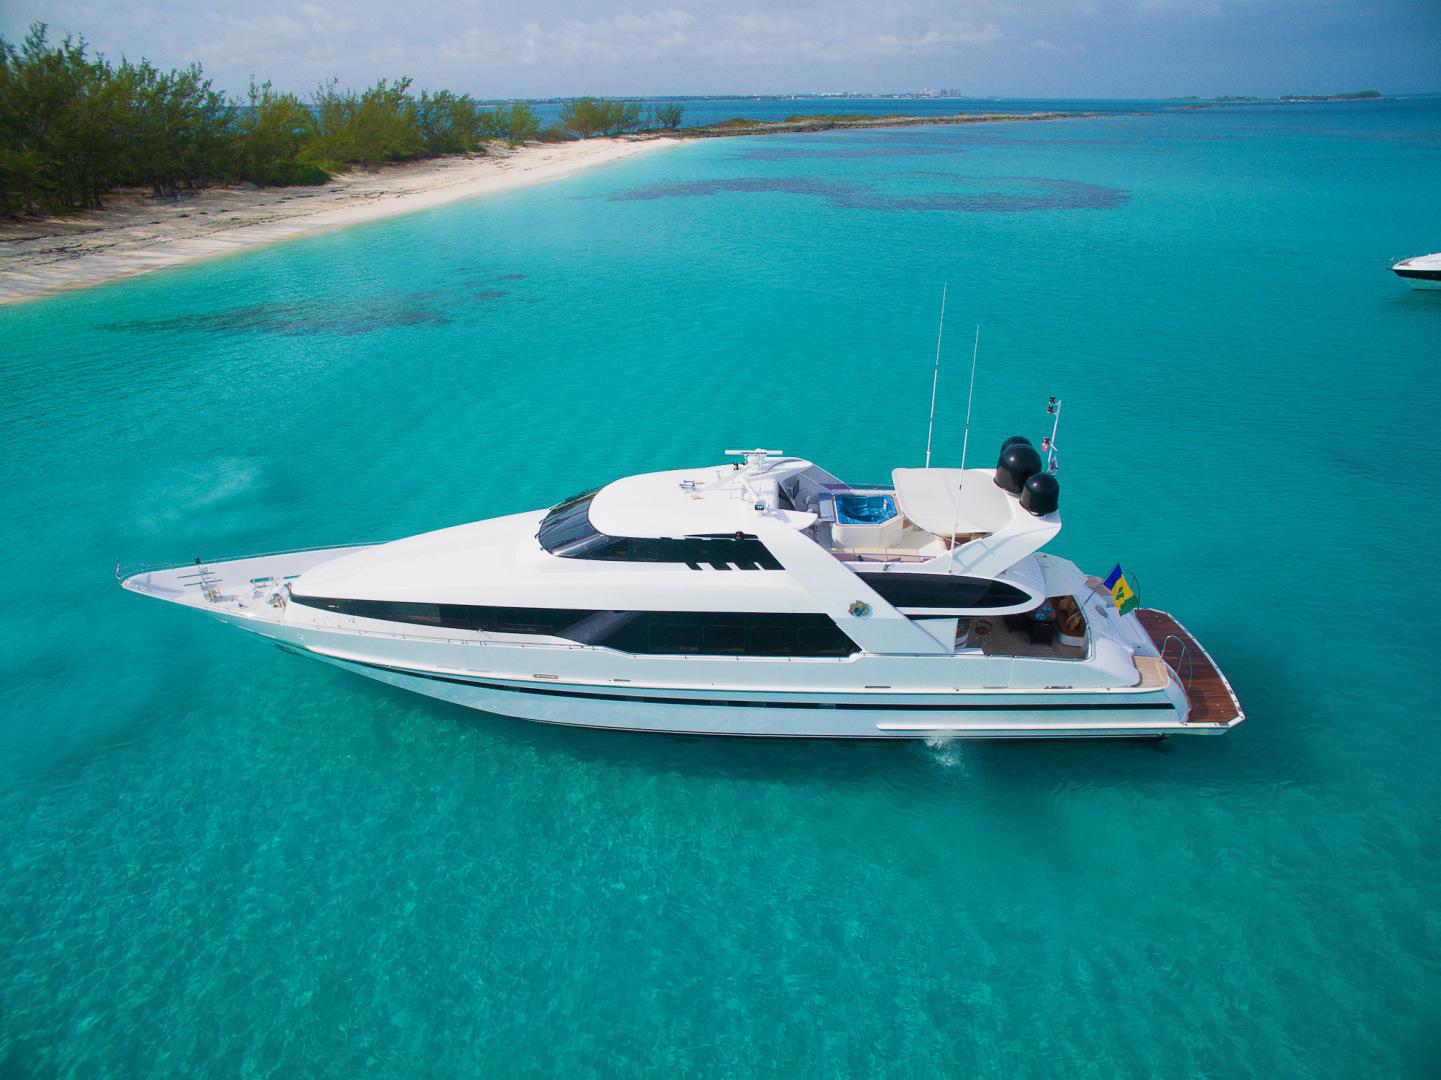 Motor Yacht-Norship 1994-Impulsive Fort Lauderdale-Florida-United States-1562555 | Thumbnail